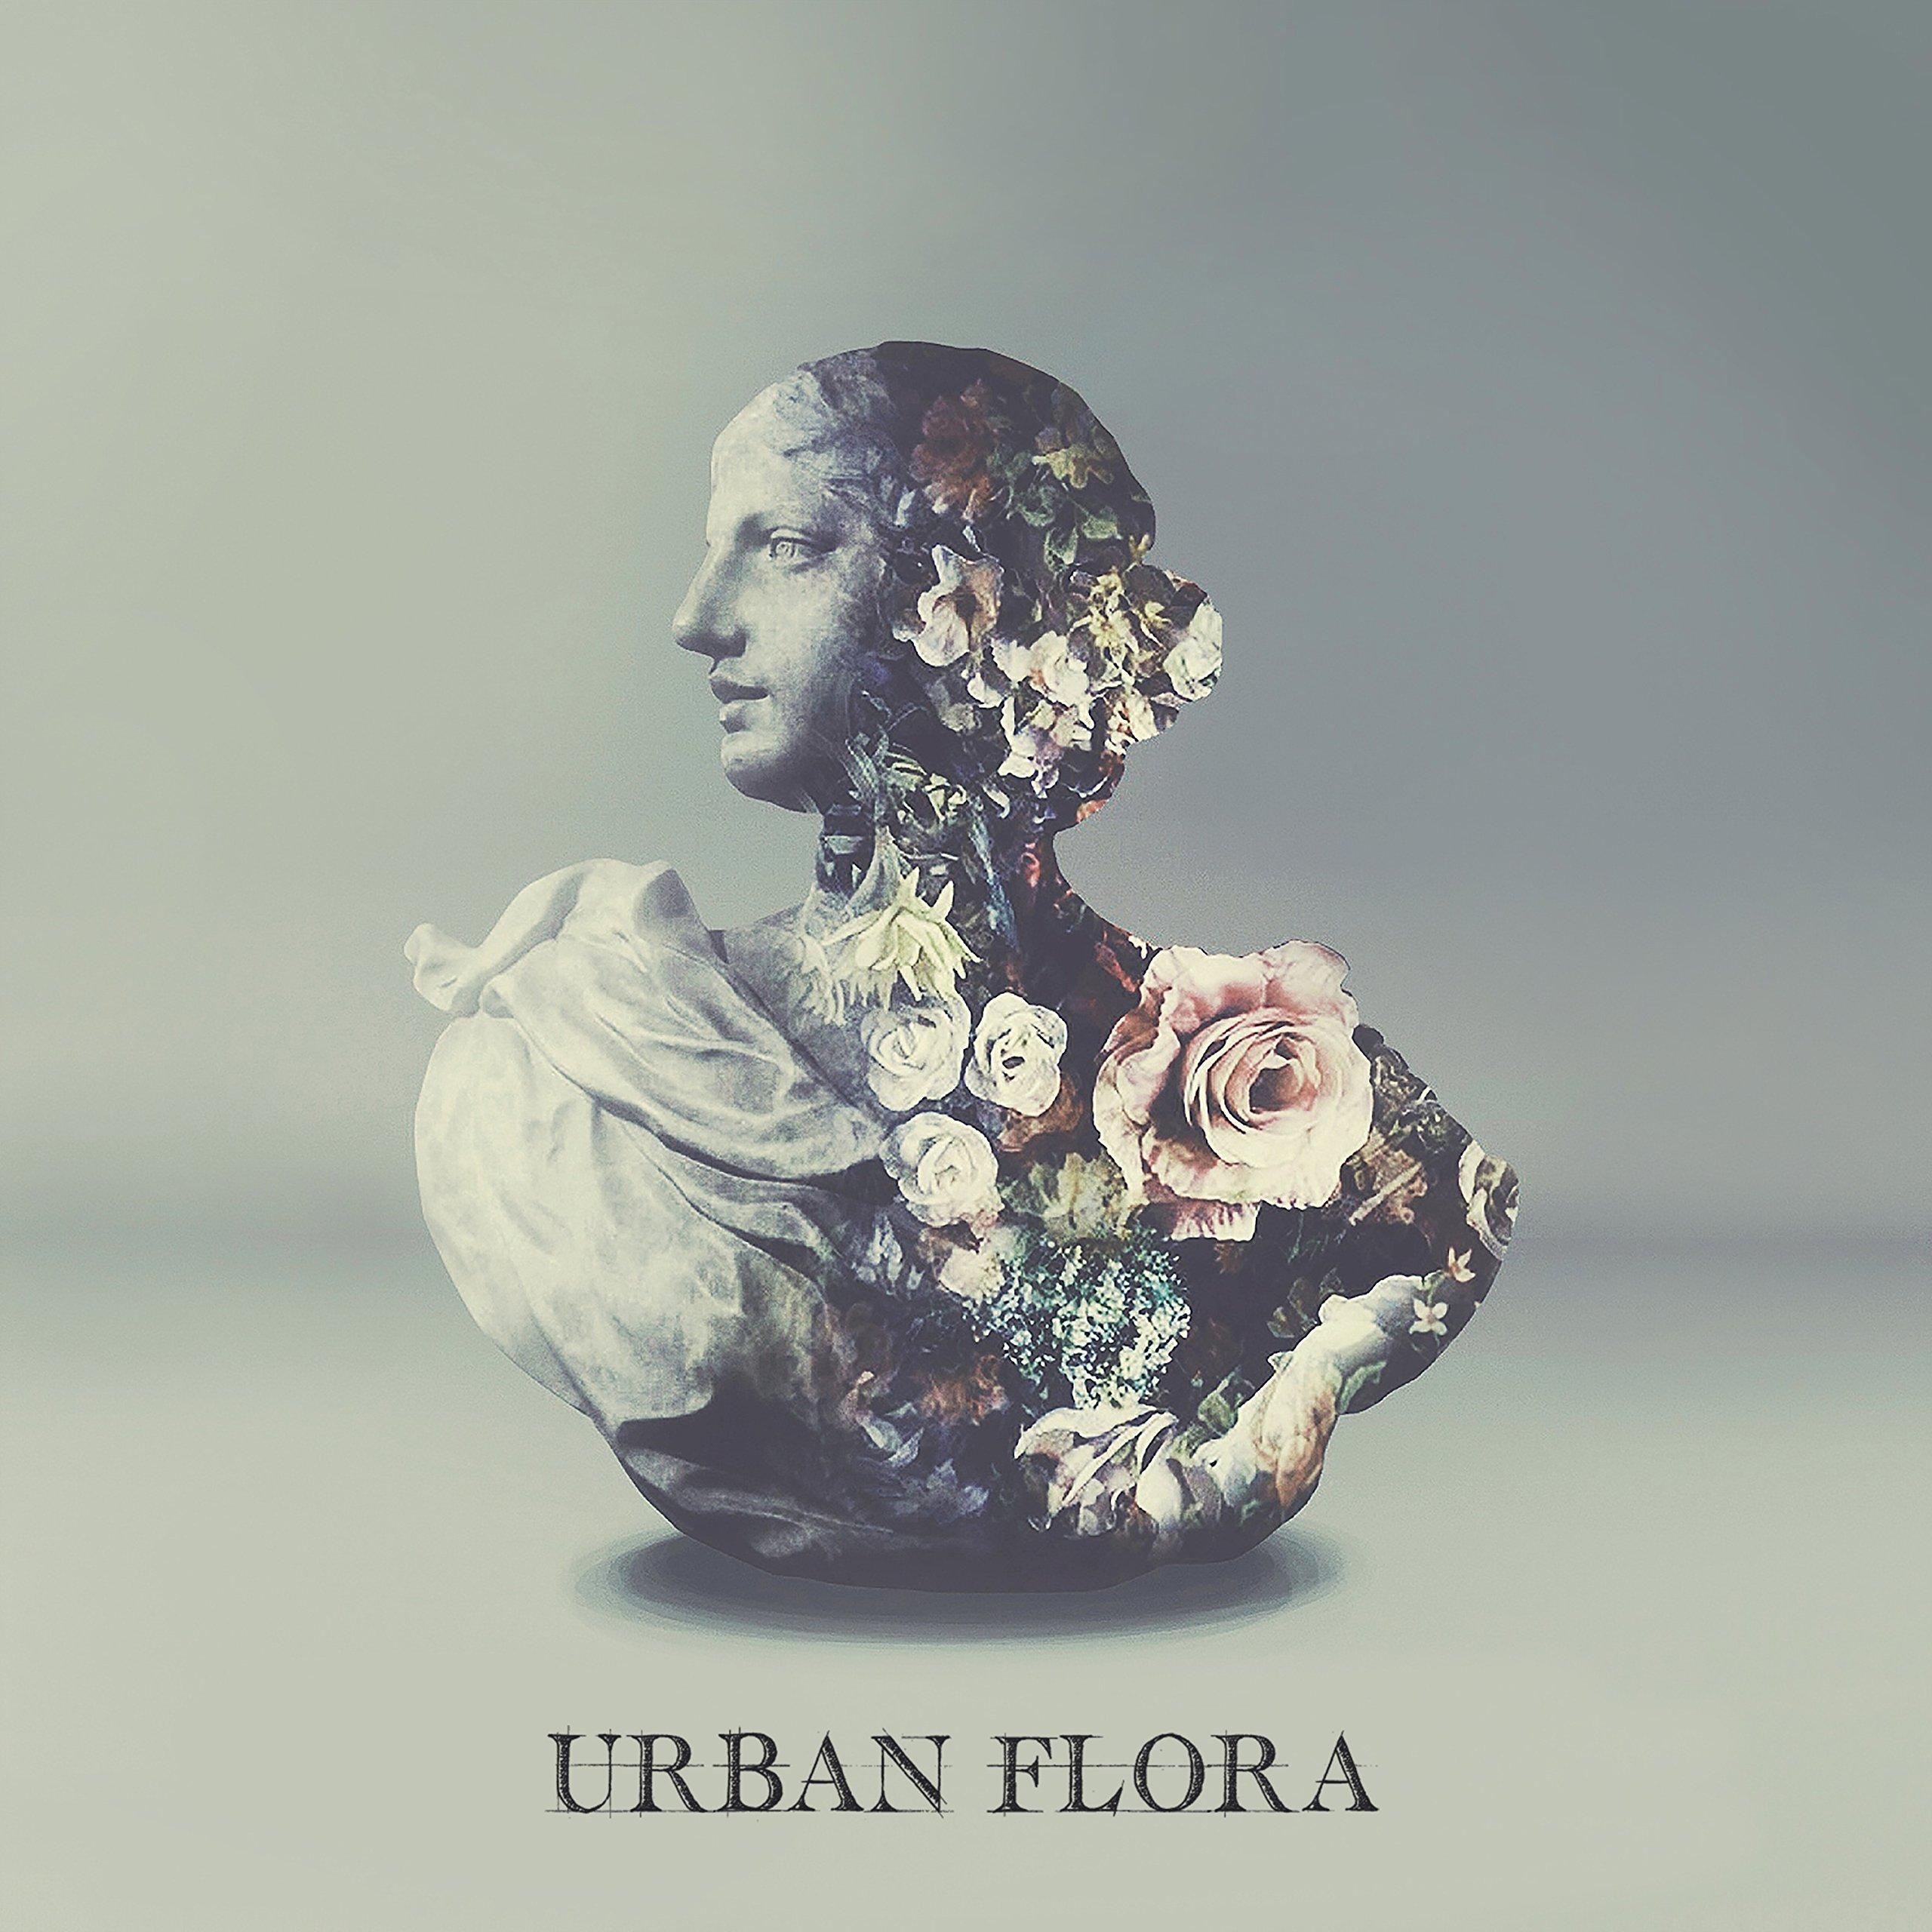 Urban Flora by MOM & POP MUSIC